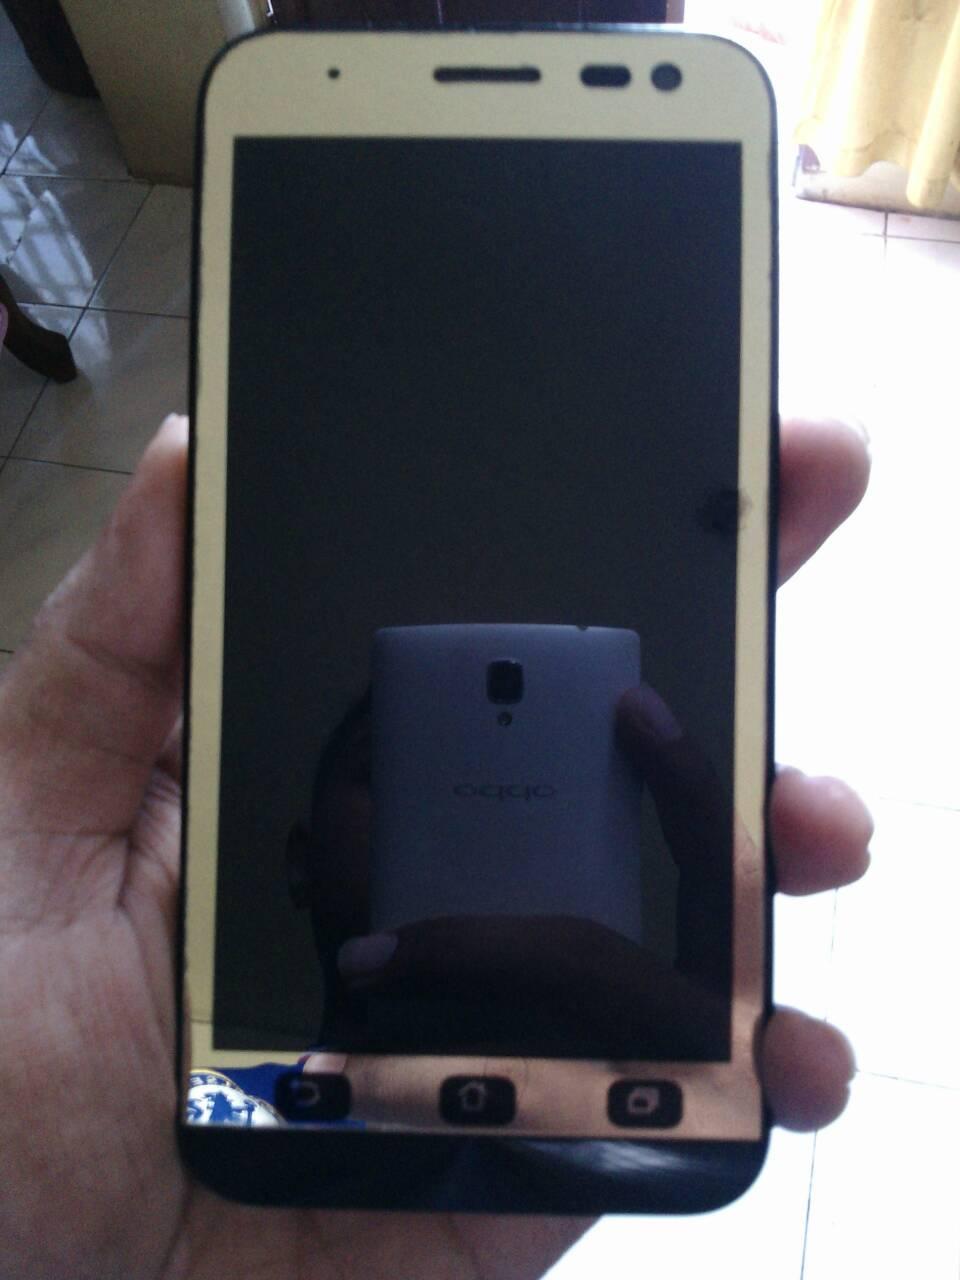 Jual Jual Hp Android Asus Zenfone 2 Laser Z00rd Ze500kg Second